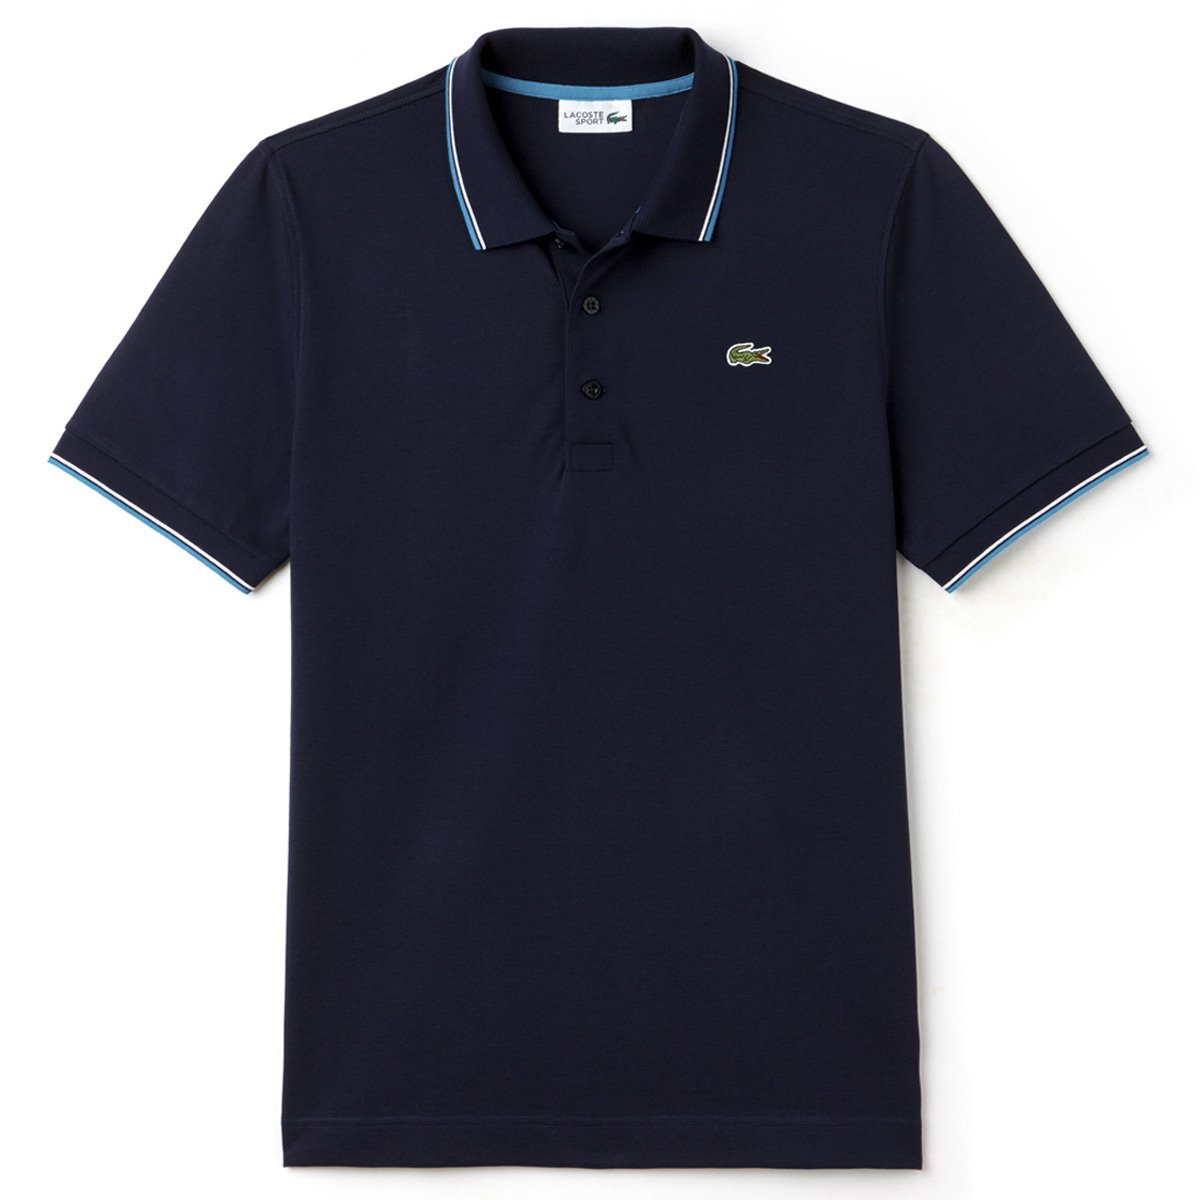 Camisa Lacoste Polo Yh790021 Masculina   Treino e Corrida 524b6879bc